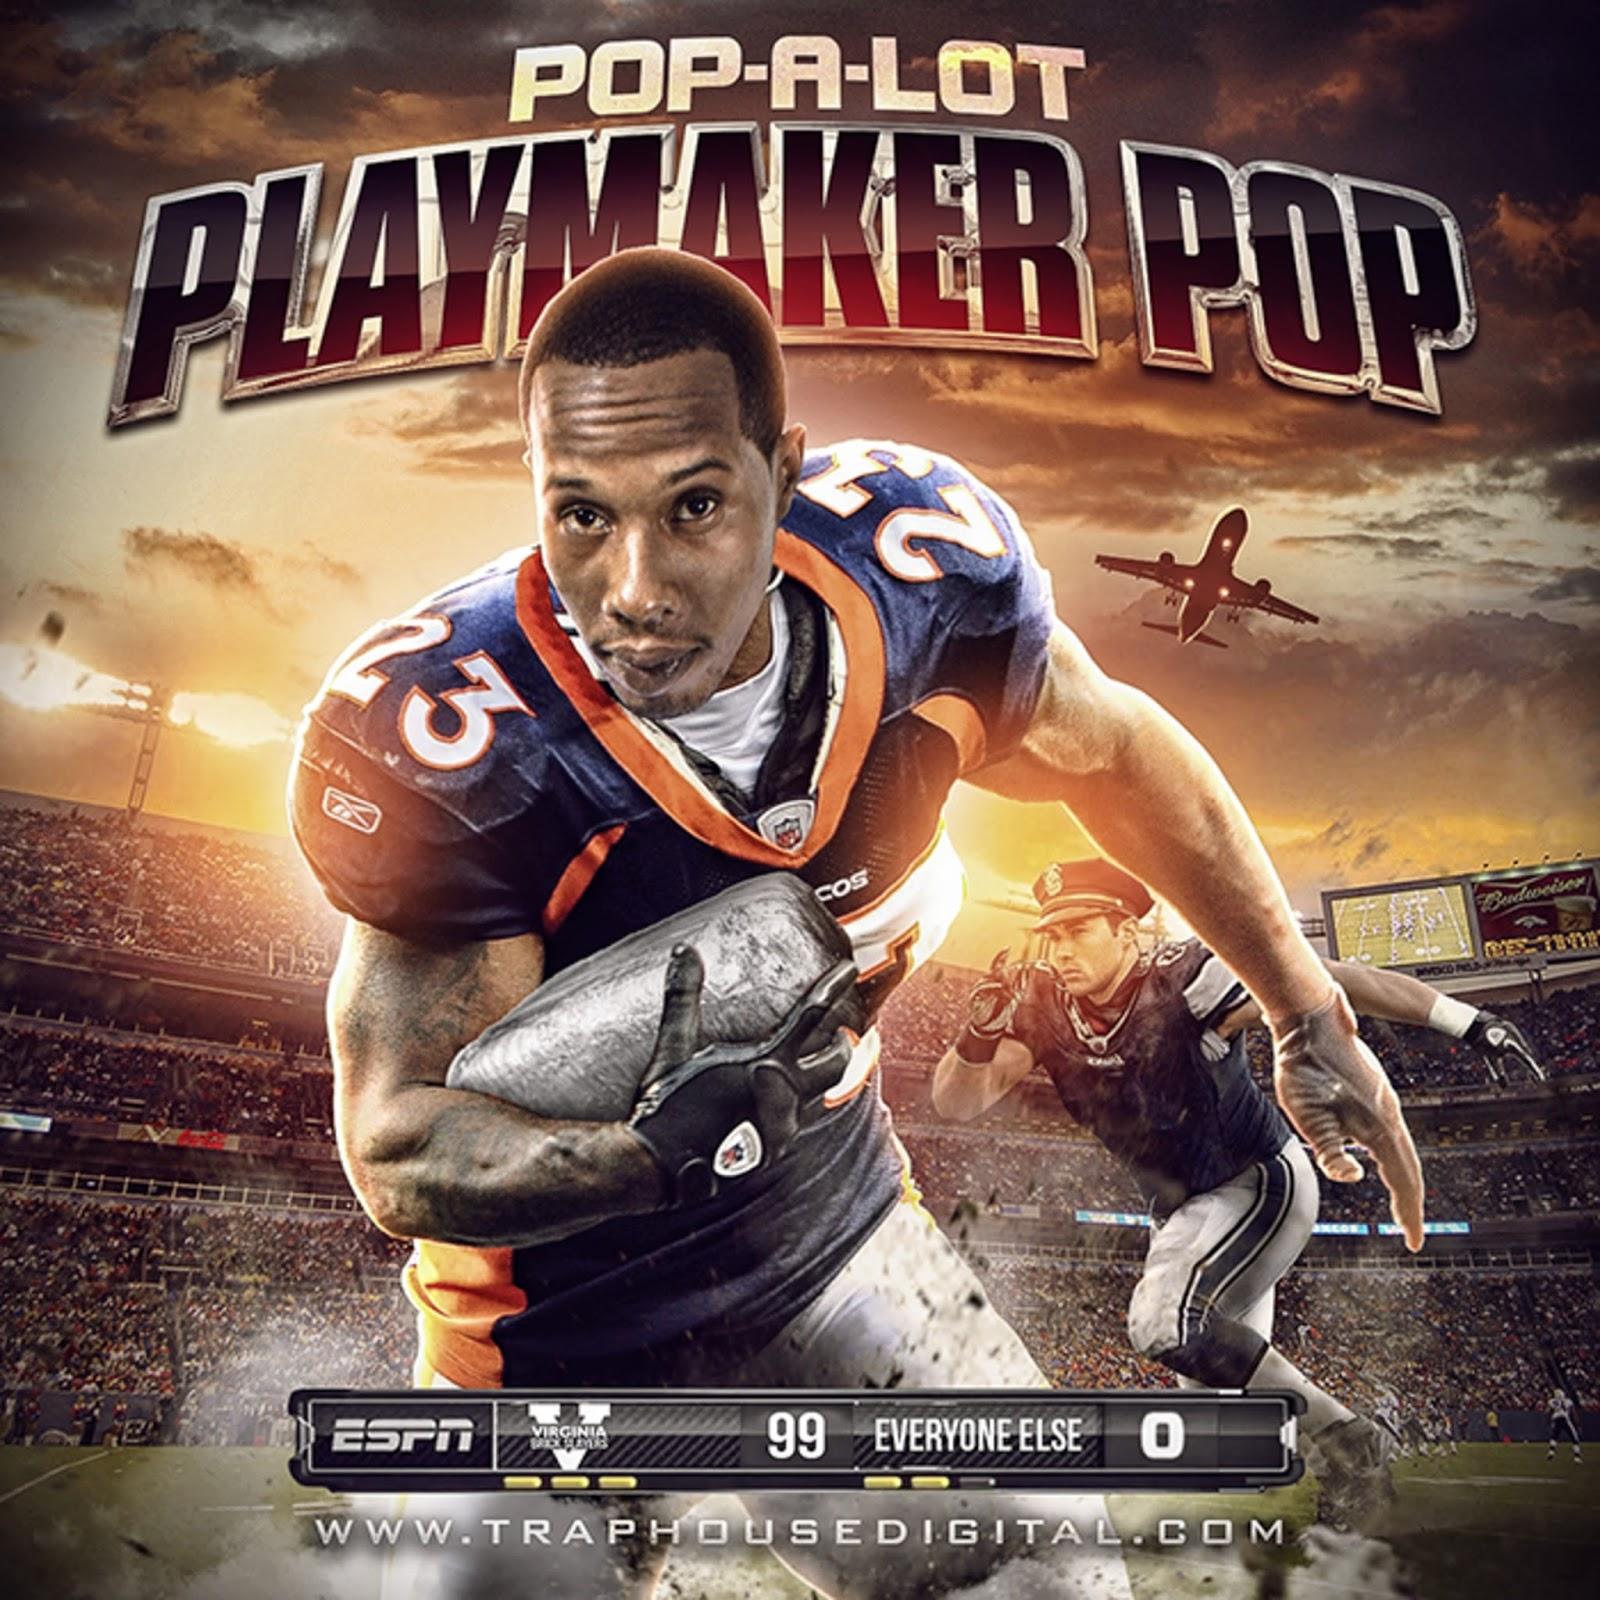 Mixtape] Pop-A-Lot (@Pop_A_Lot) - PlayMaker Pop